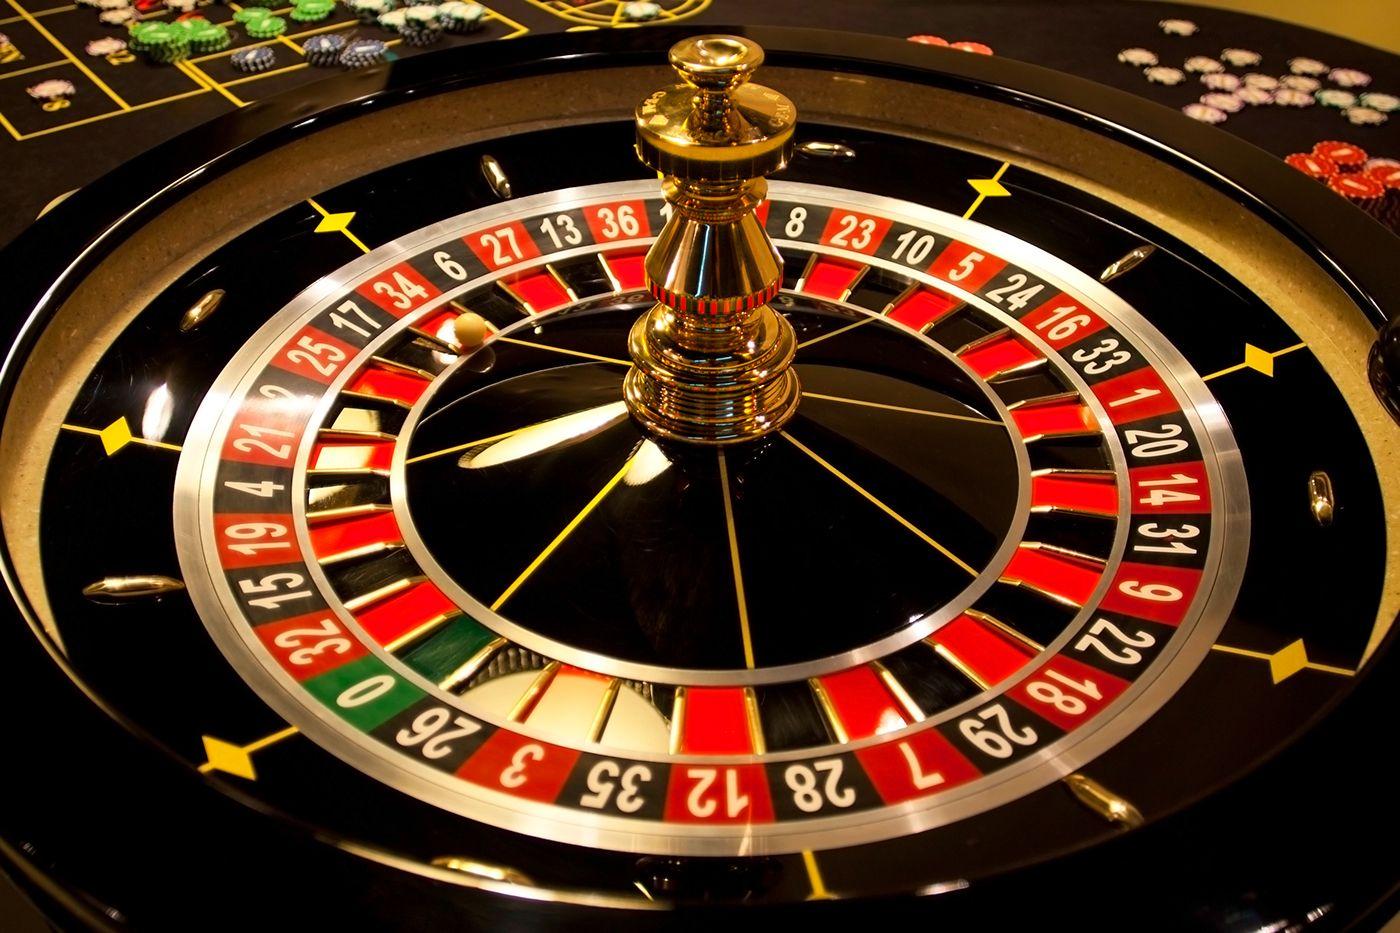 Casinos worldmatch cassino roleta 36506